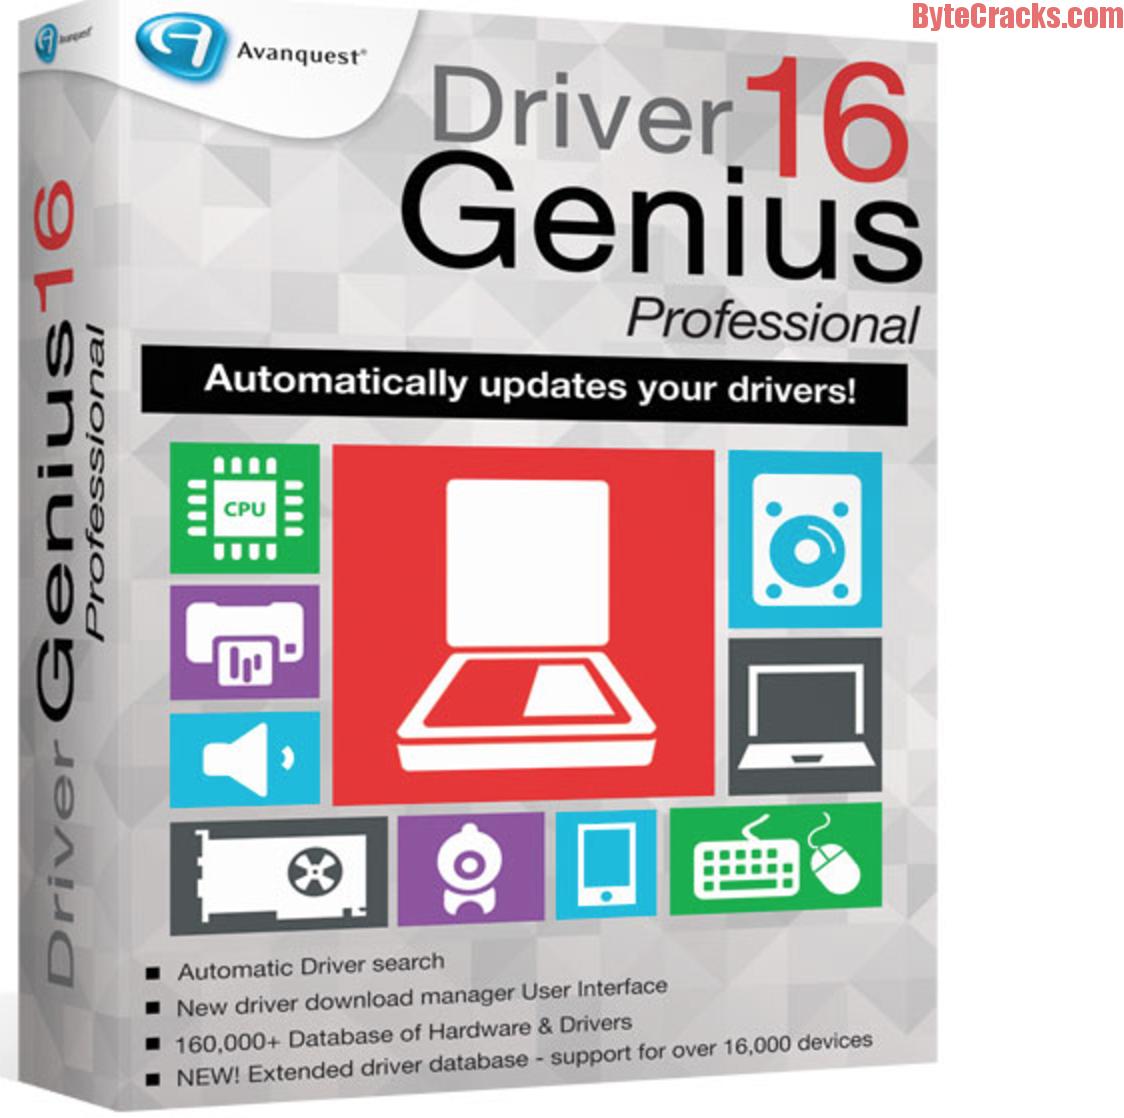 Download manycam enterprise 5 0 5 2 multilingual - Driver Genius 16 Full Version License Key Driver Genius 16 Crack Scans Your Pc For